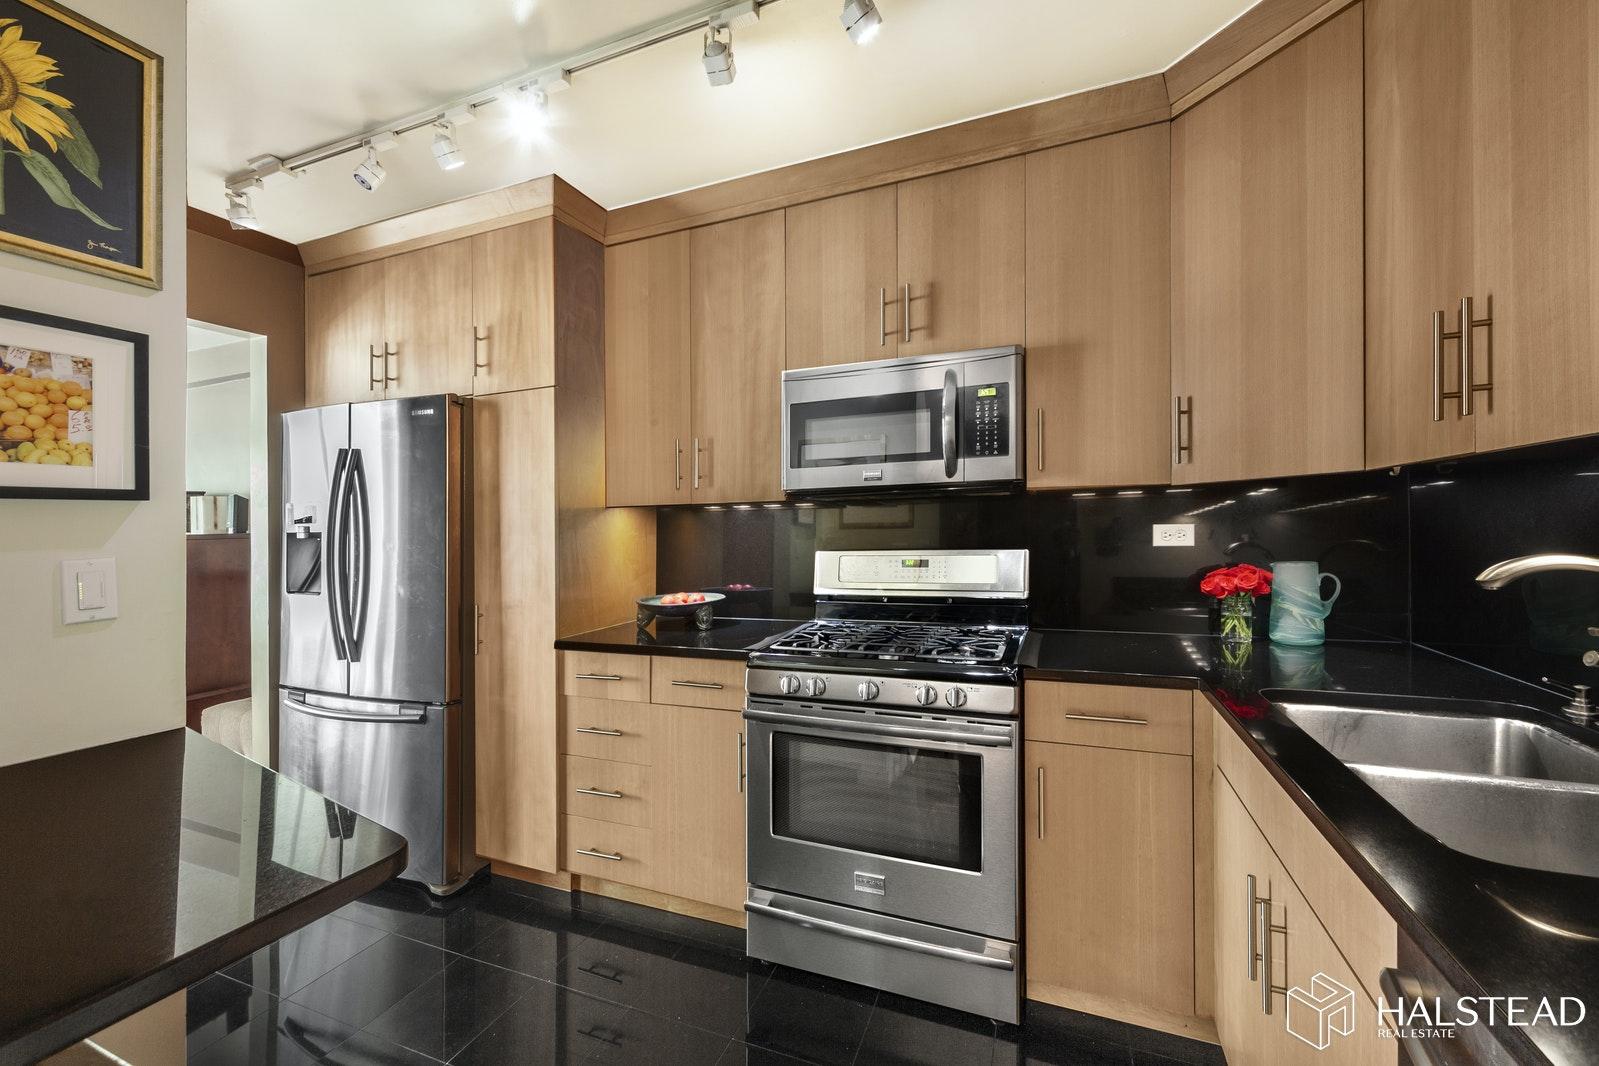 200 EAST 27TH STREET 2R, Murray Hill Kips Bay, $1,199,000, Web #: 19903251